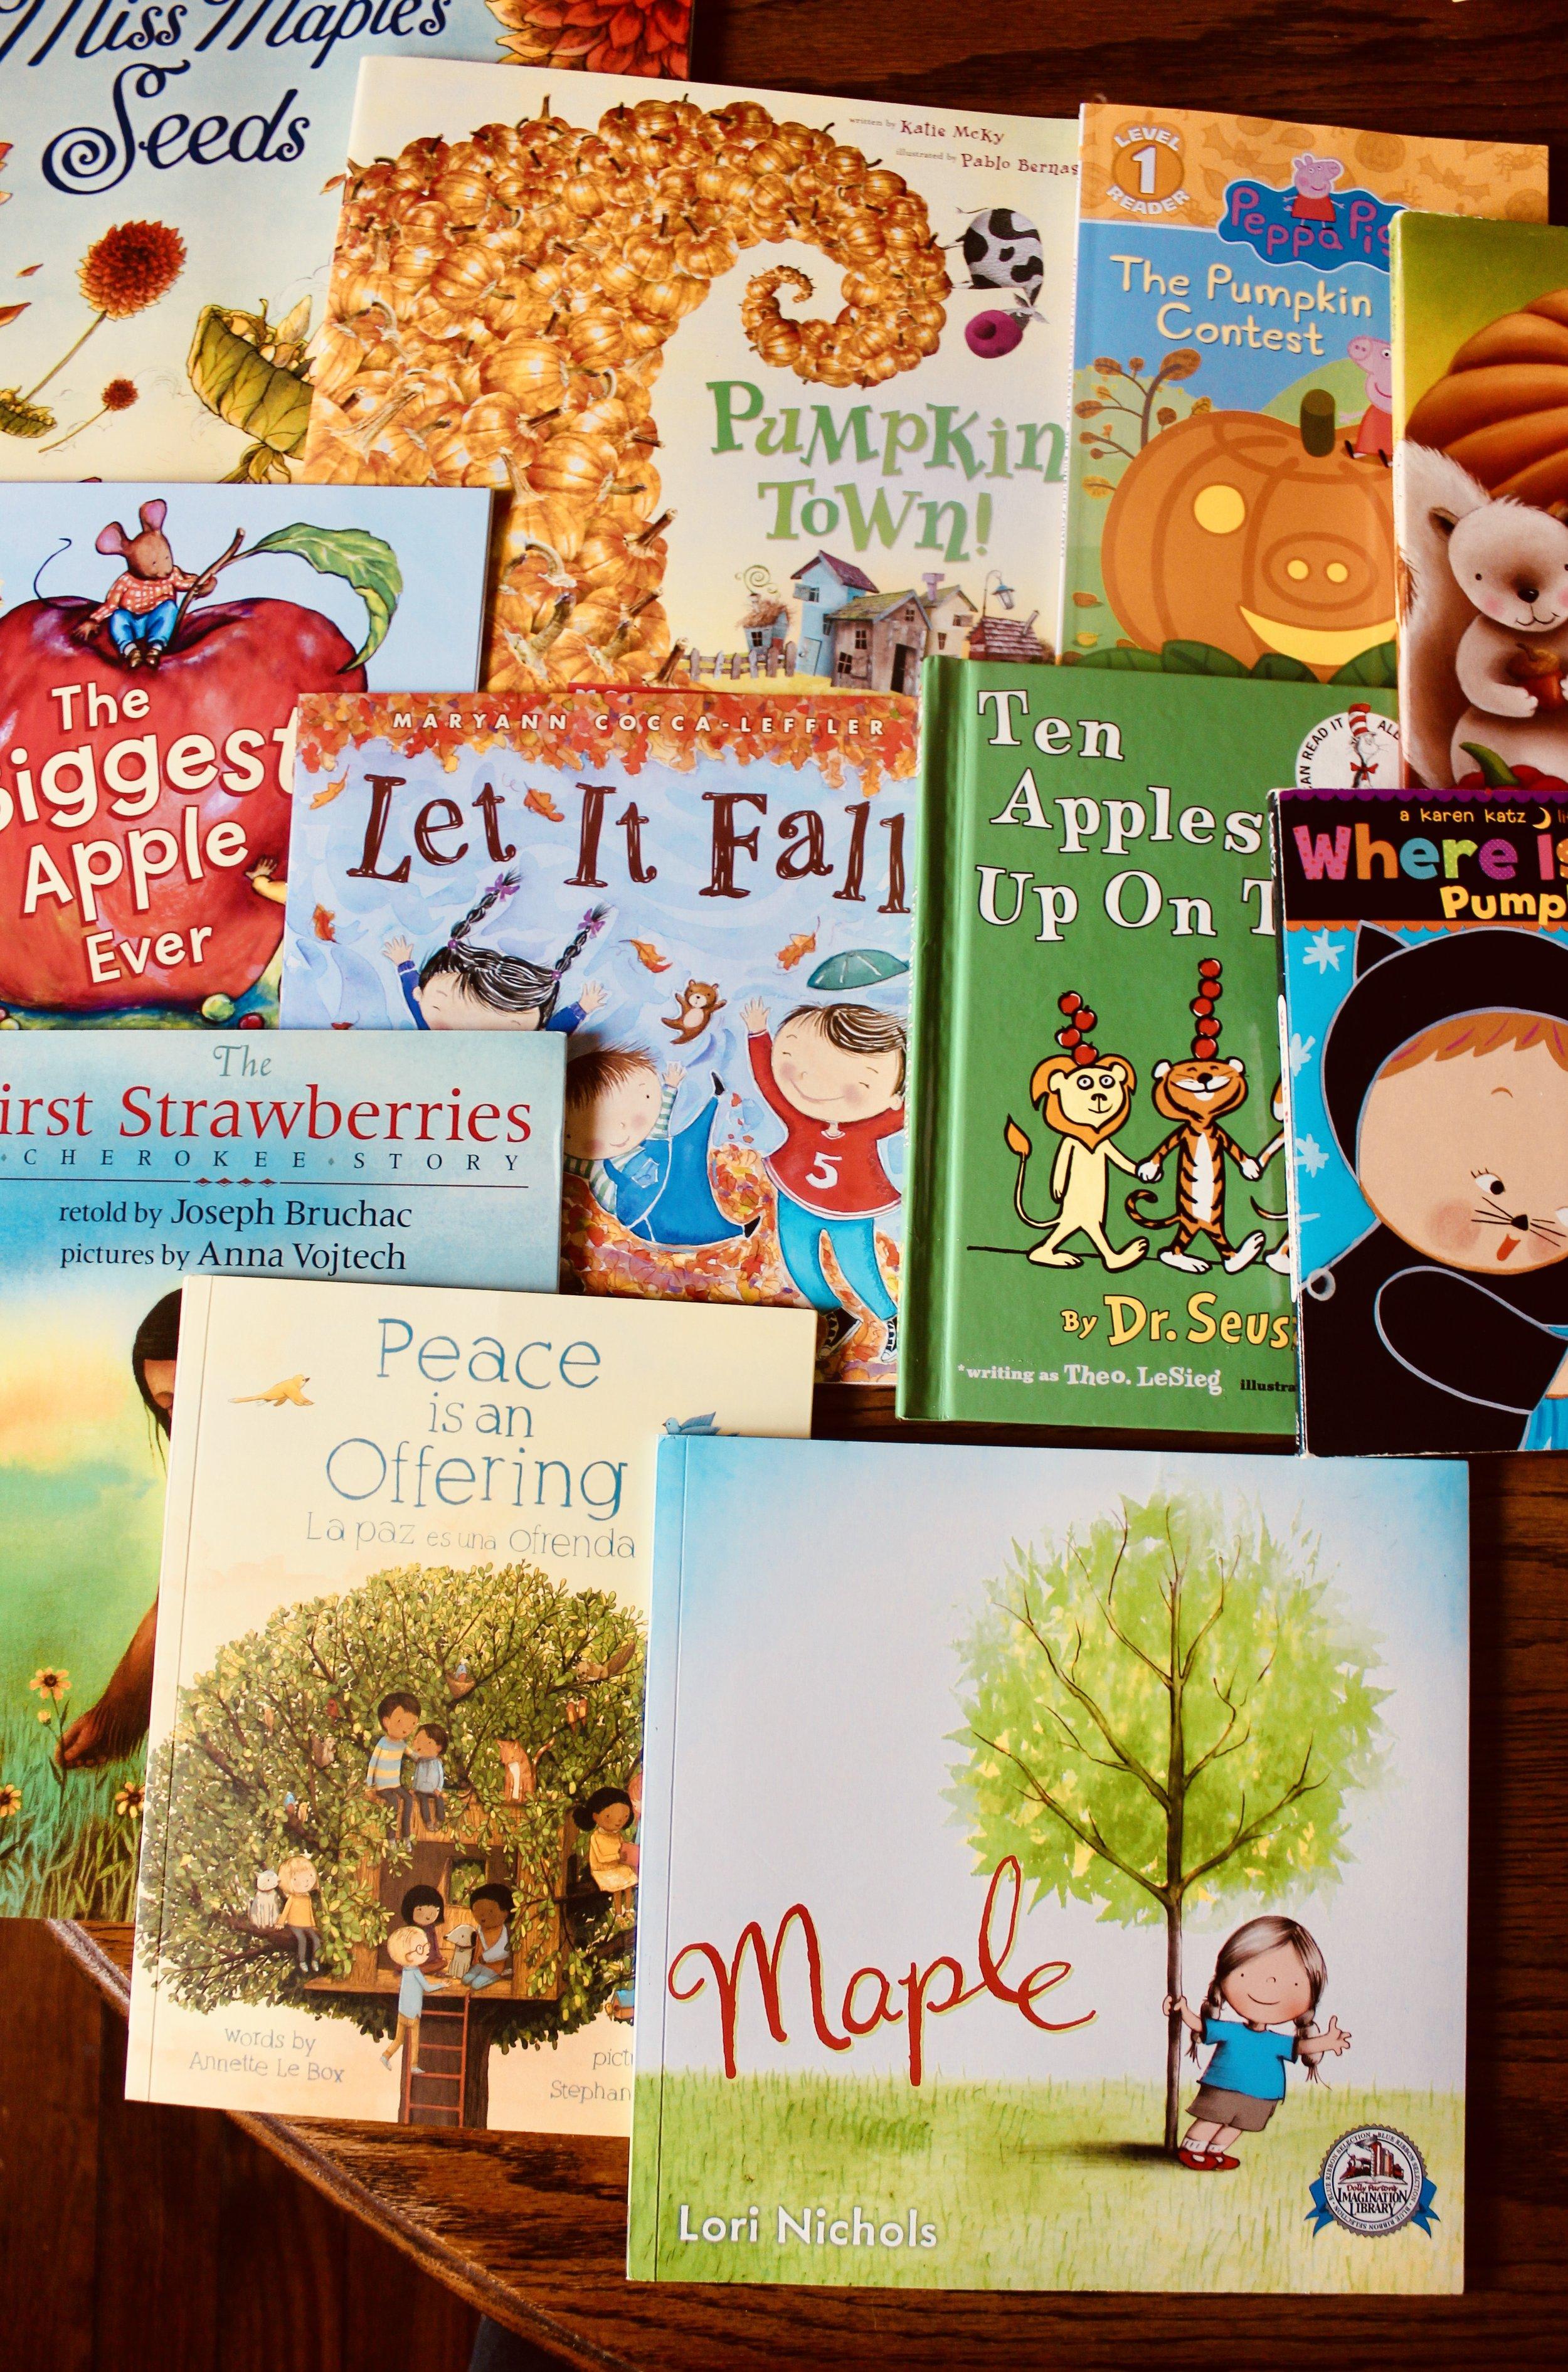 Seasonal Book Bins for the Home